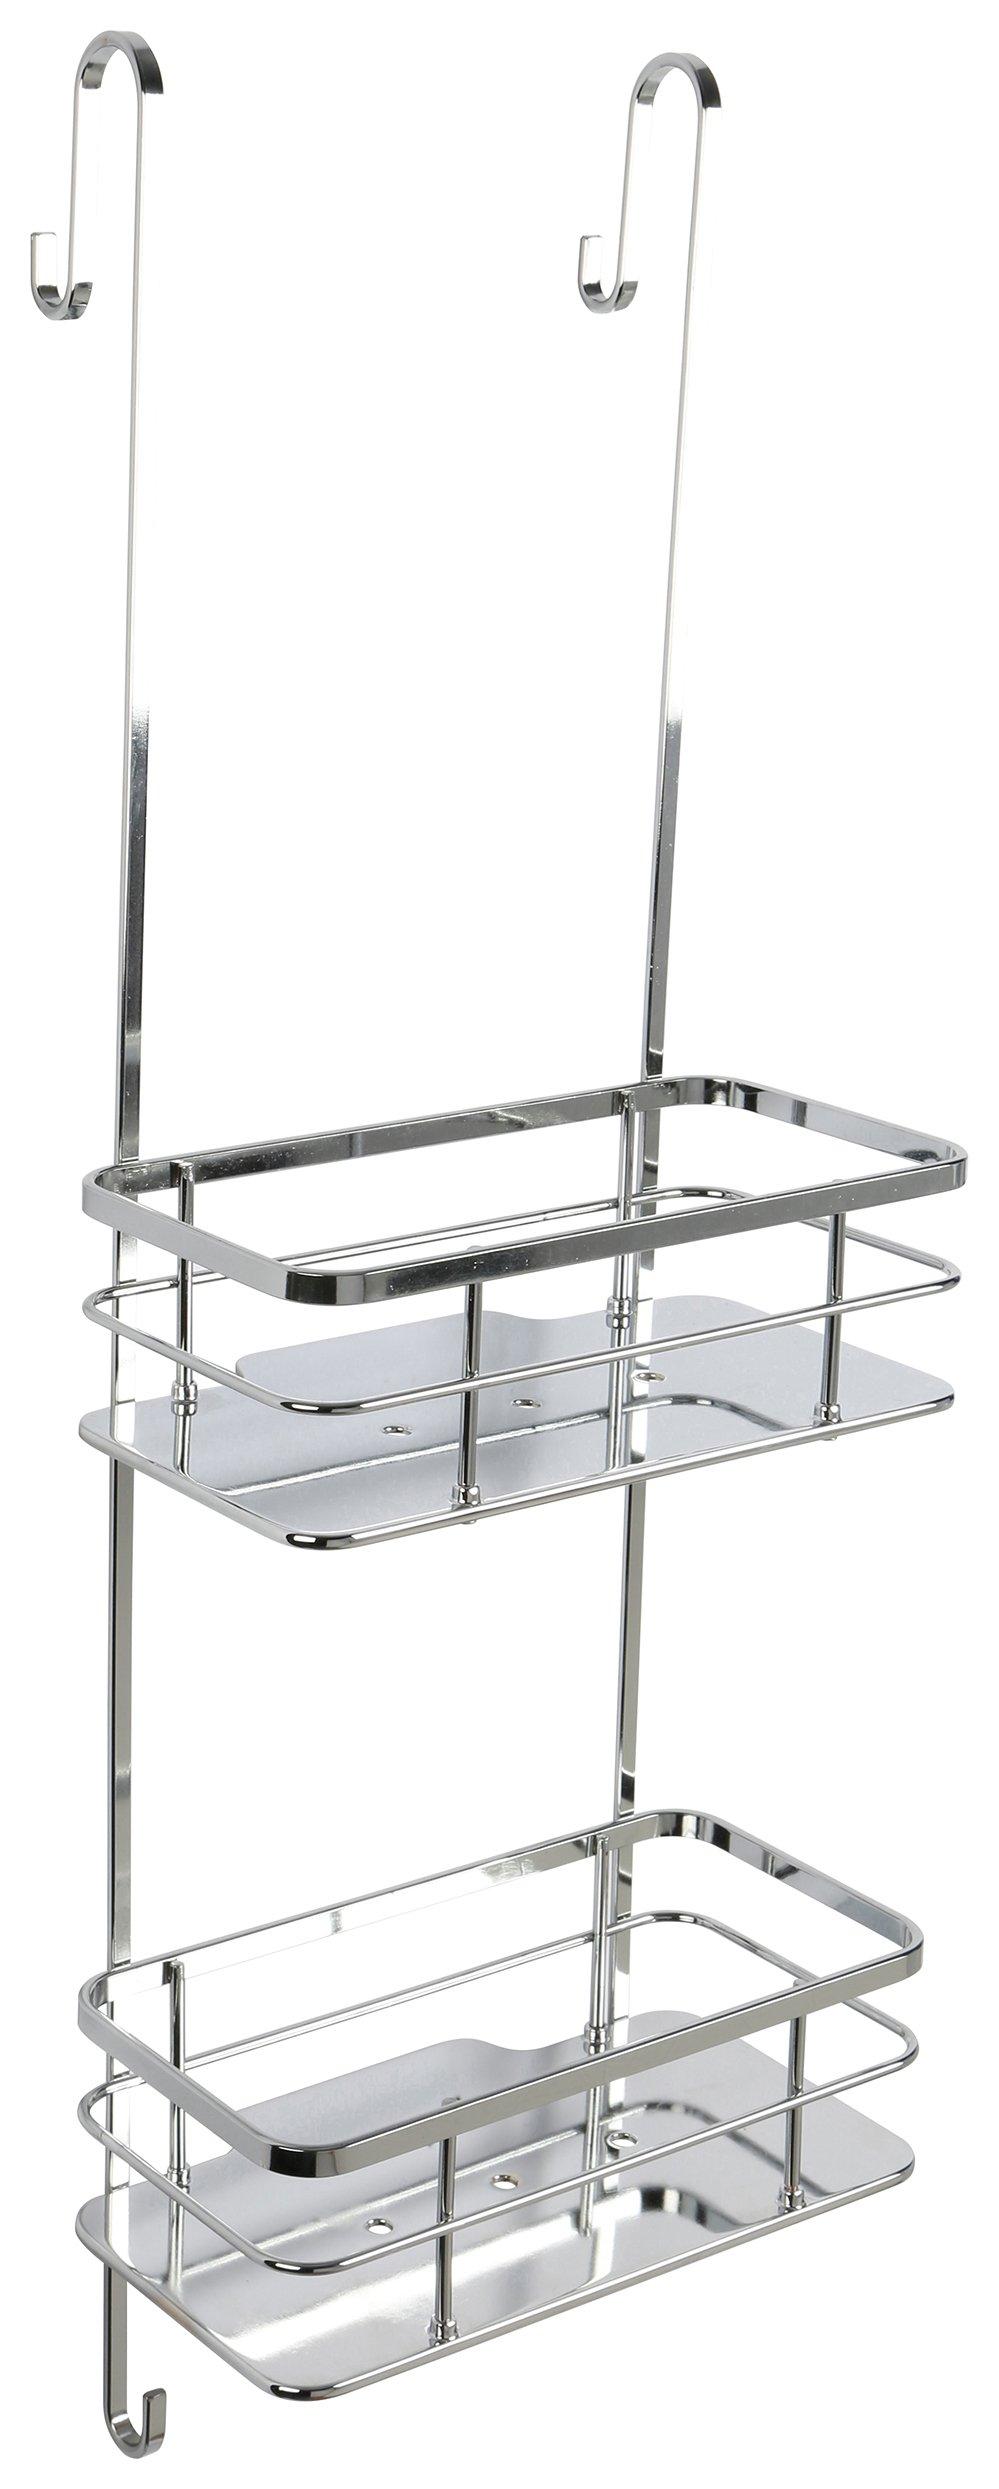 Image of Croydex Charlwood 2 Tier Chrome Flexi Fit Hook Over Basket